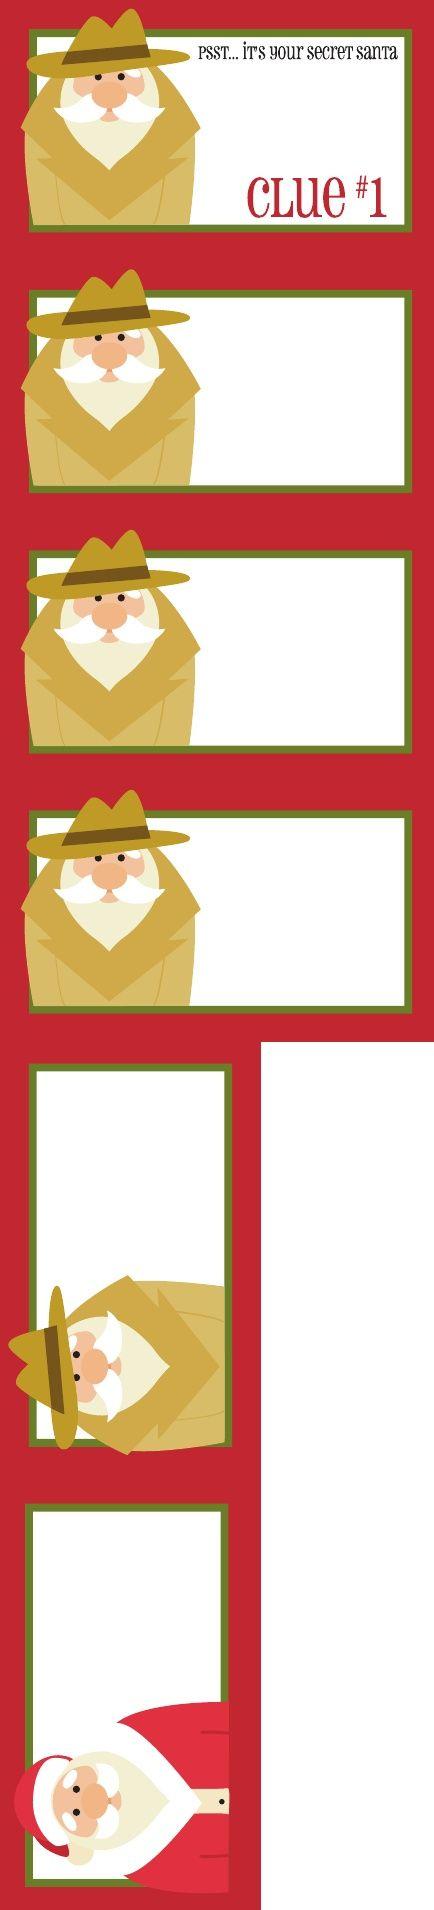 Printable Secret Santa Gift Tags